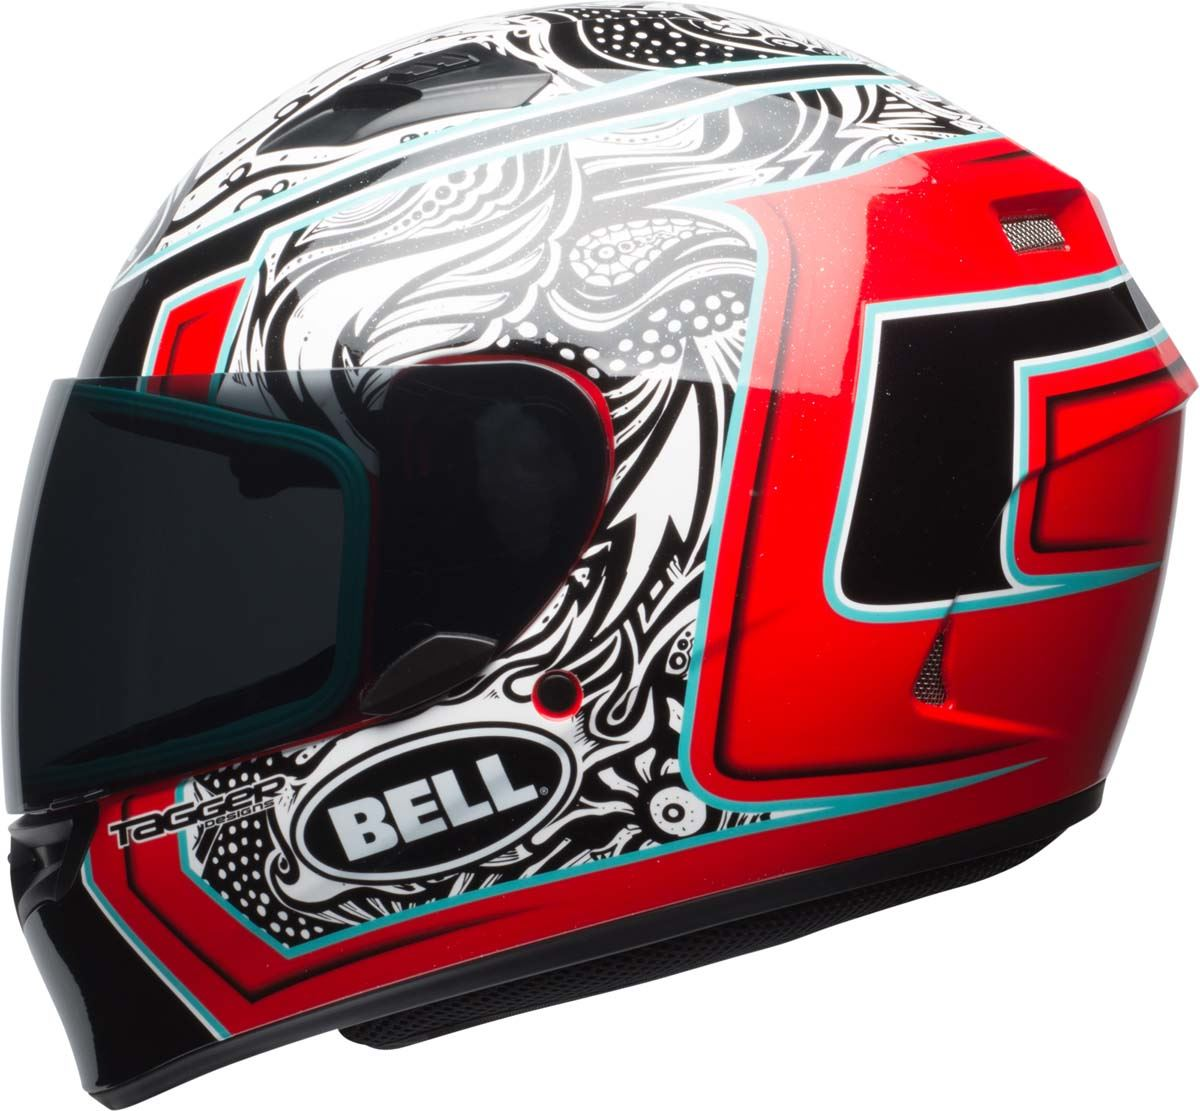 Bell-Qualifier-Helmet-Full-Face-Motorcycle-Clear-Shield-DOT-XS-3XL miniature 49